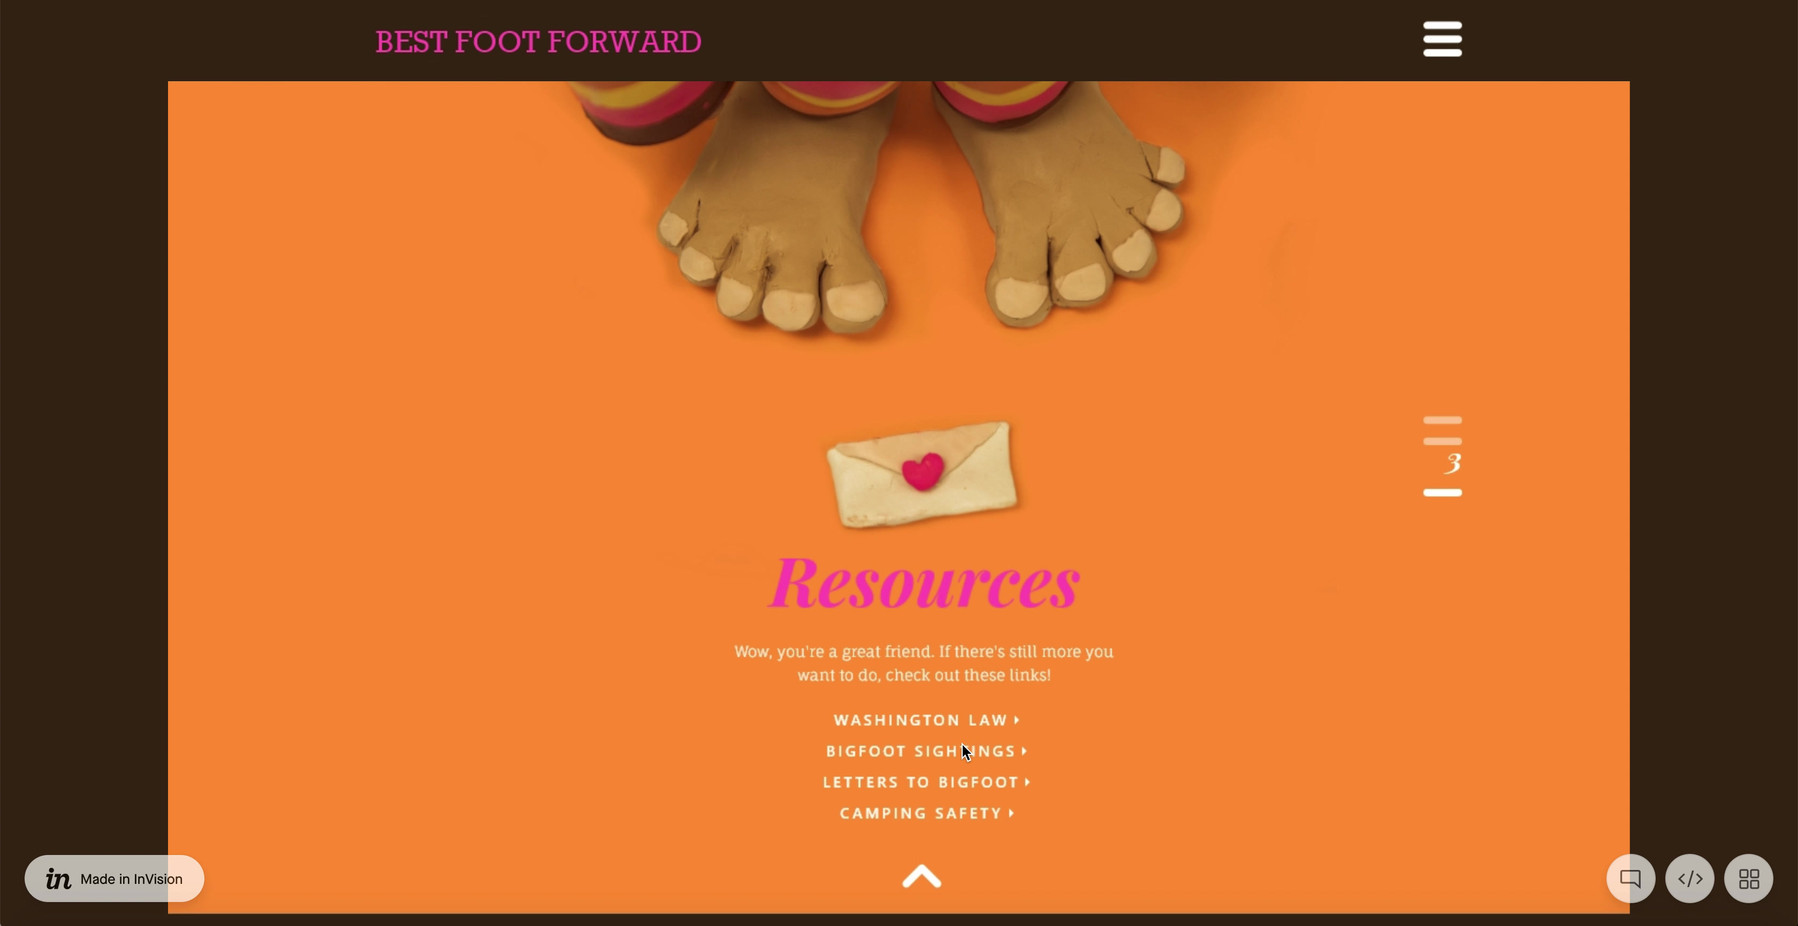 Responsive Design Desktop - Ad Council P